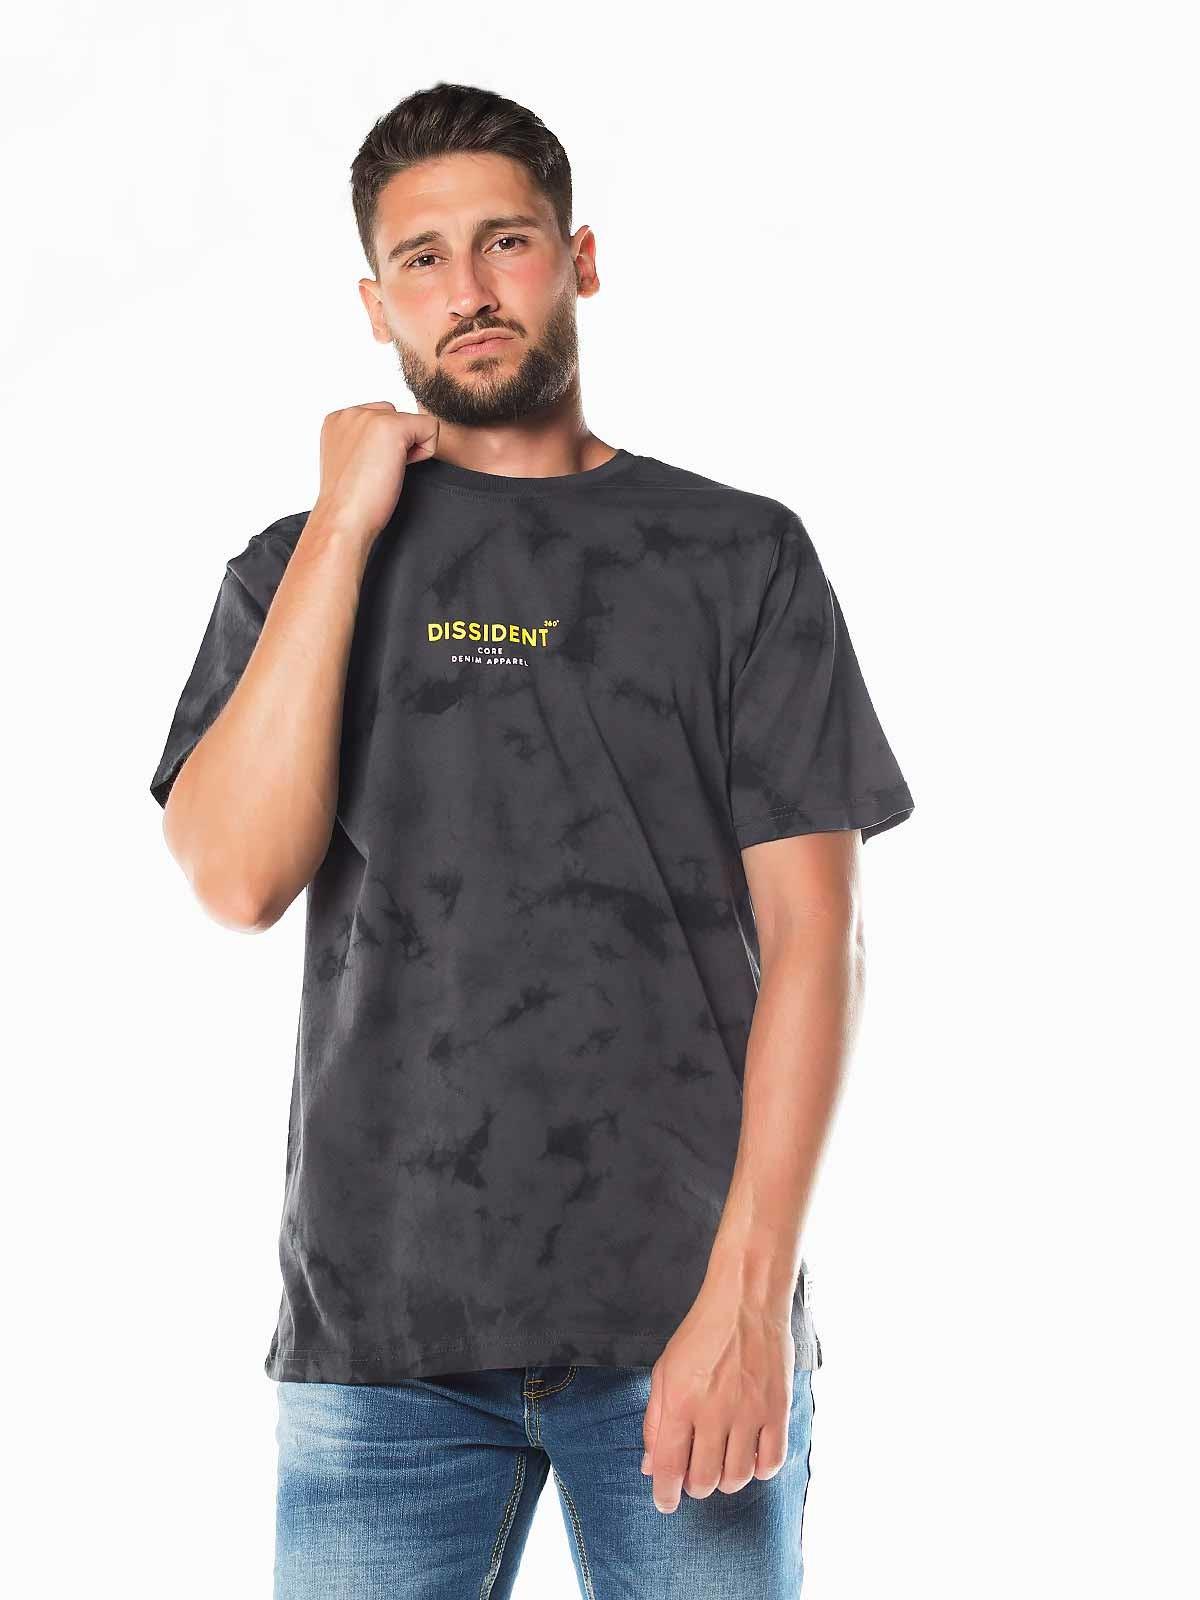 Camiseta manga corta Dissident